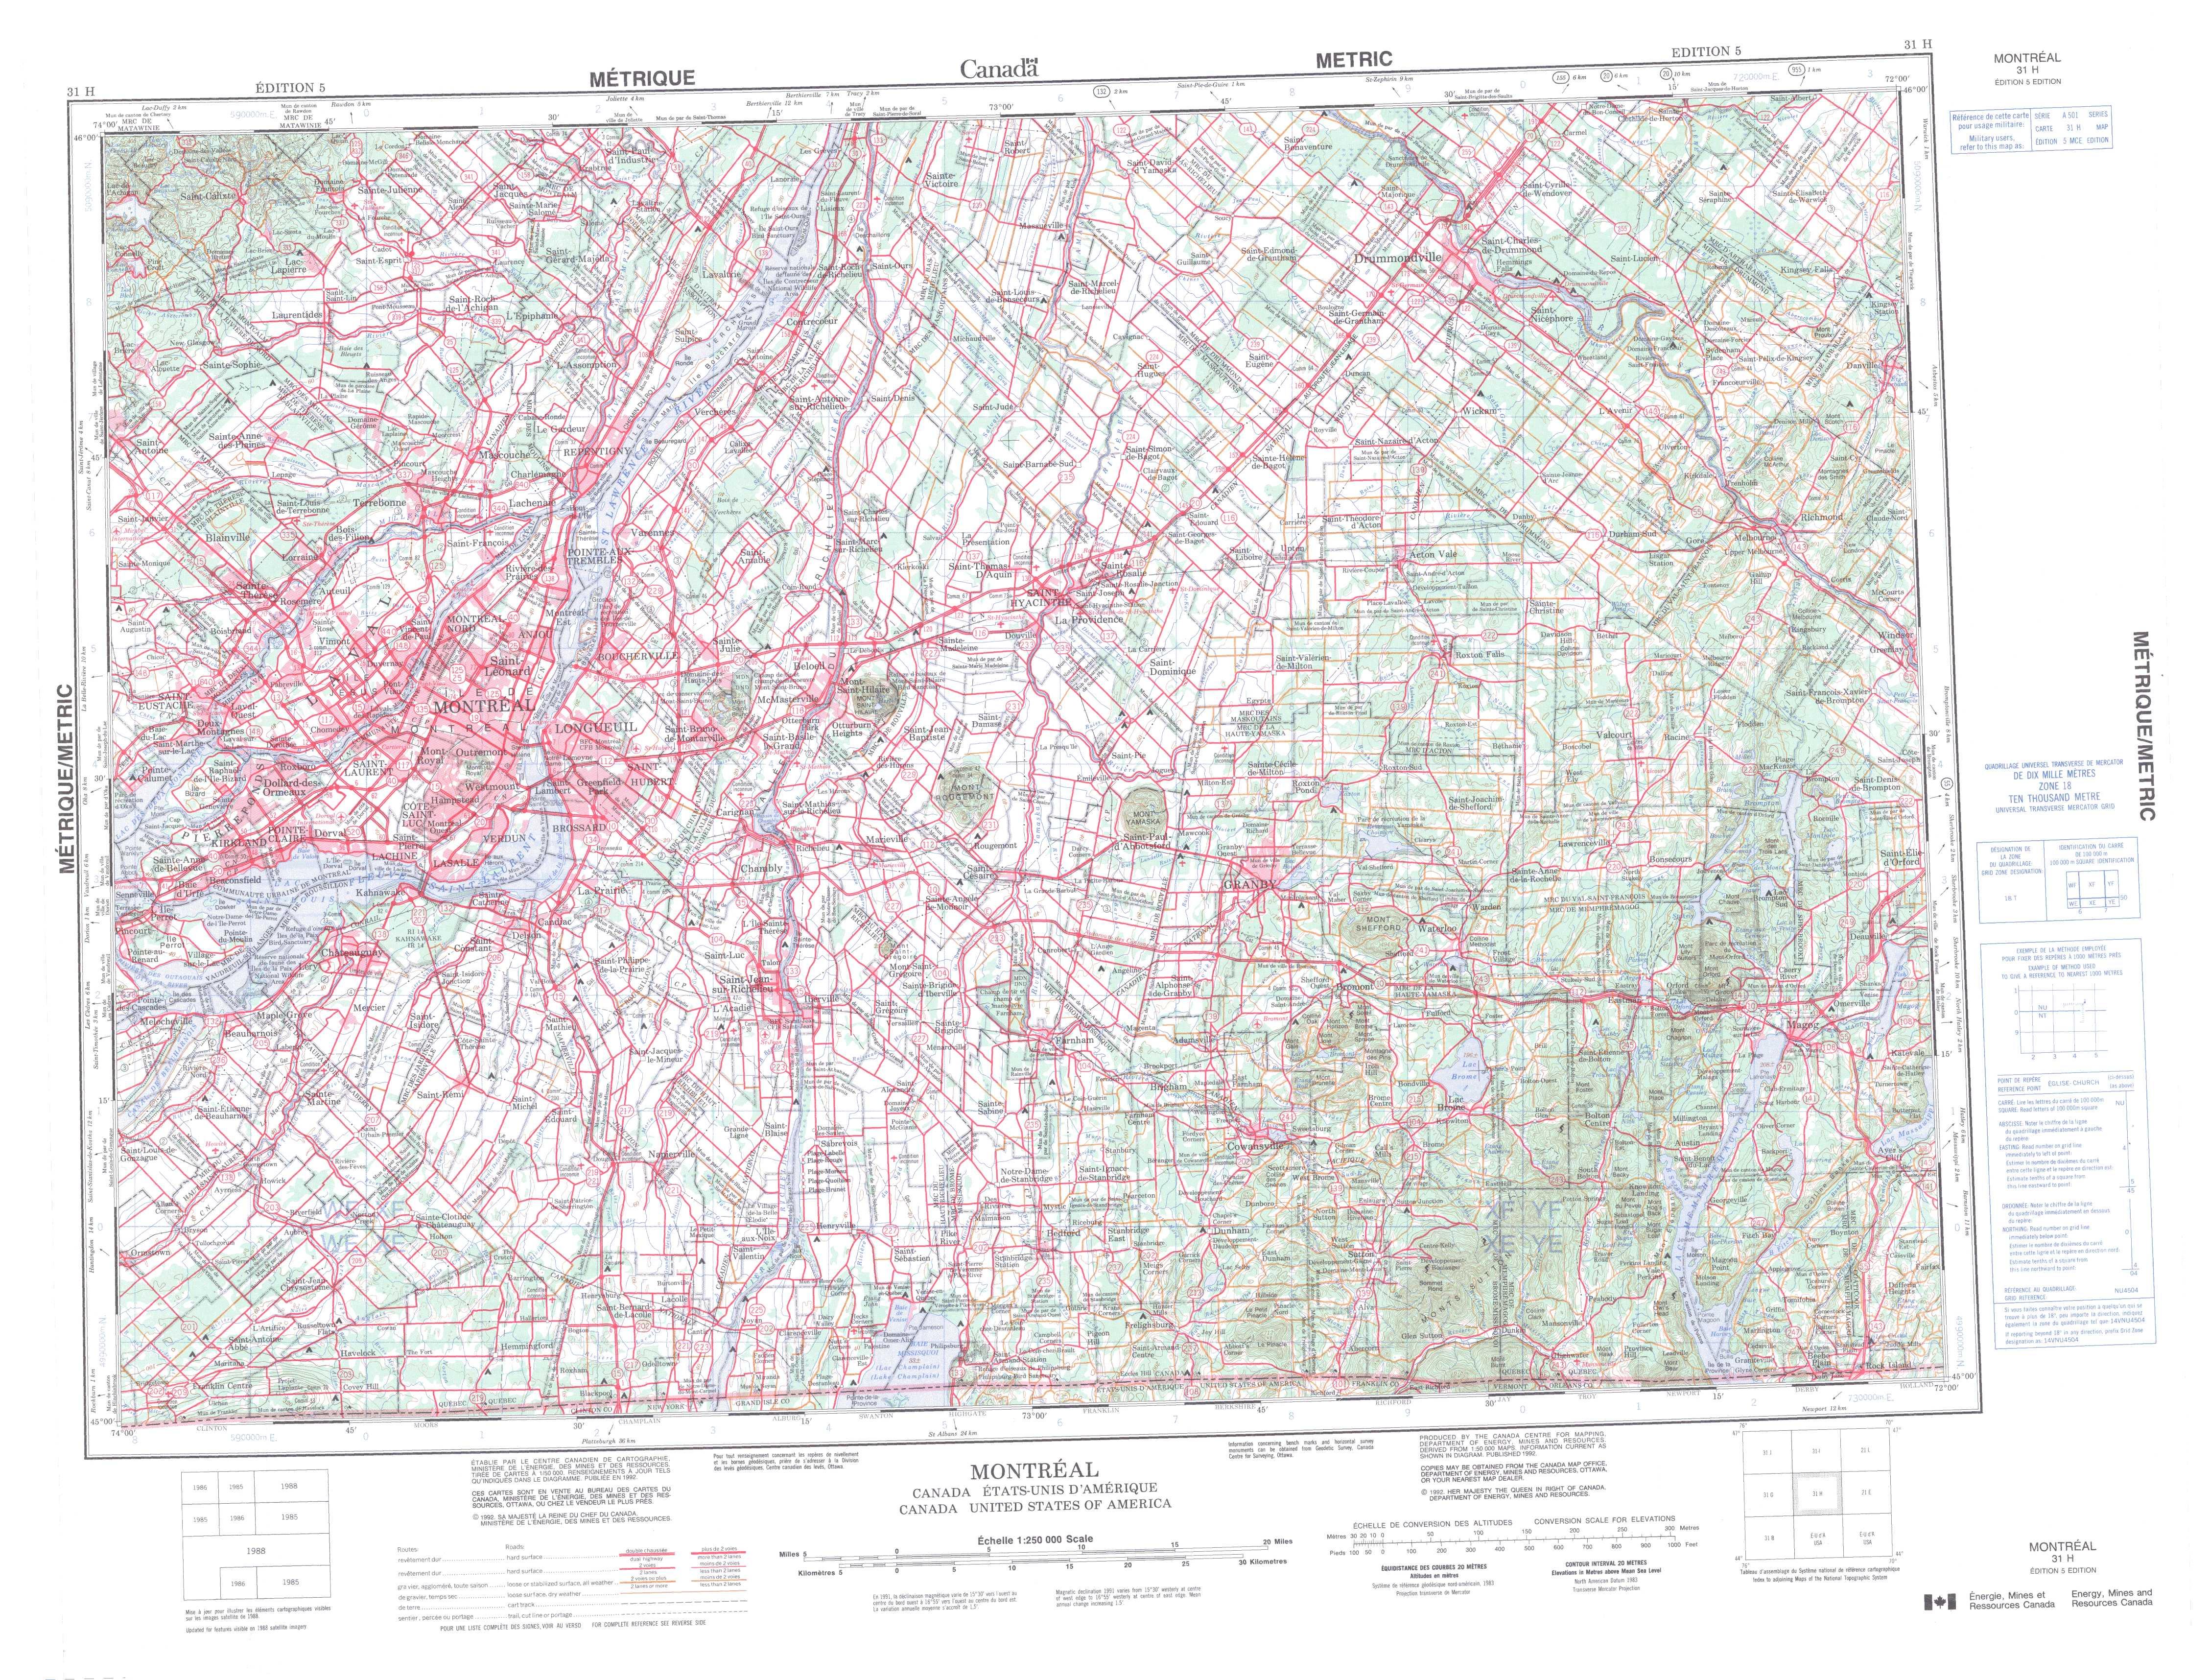 Printable Topographic Map Of Montreal 031H, Qc - Free Printable Topo Maps